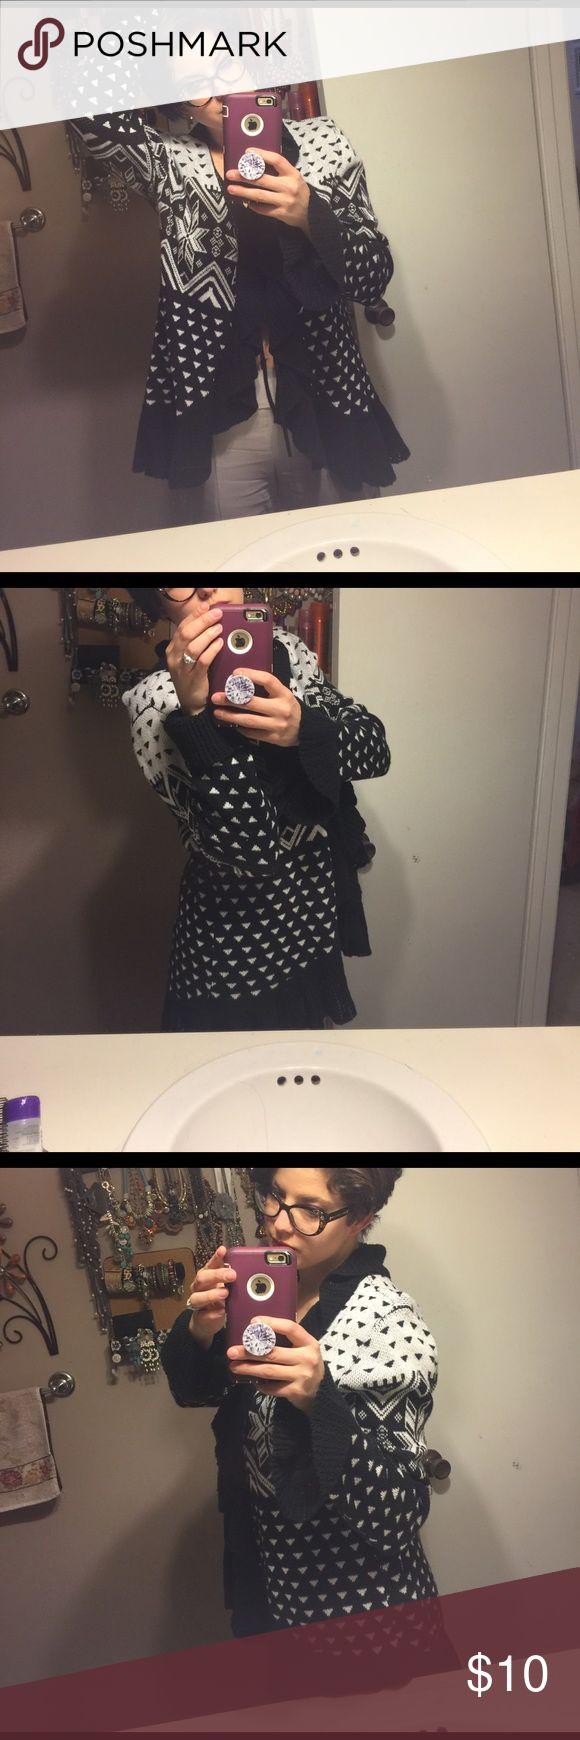 Black and white Aztec print Ruffle cardigan sweater Sweaters Shrugs & Ponchos